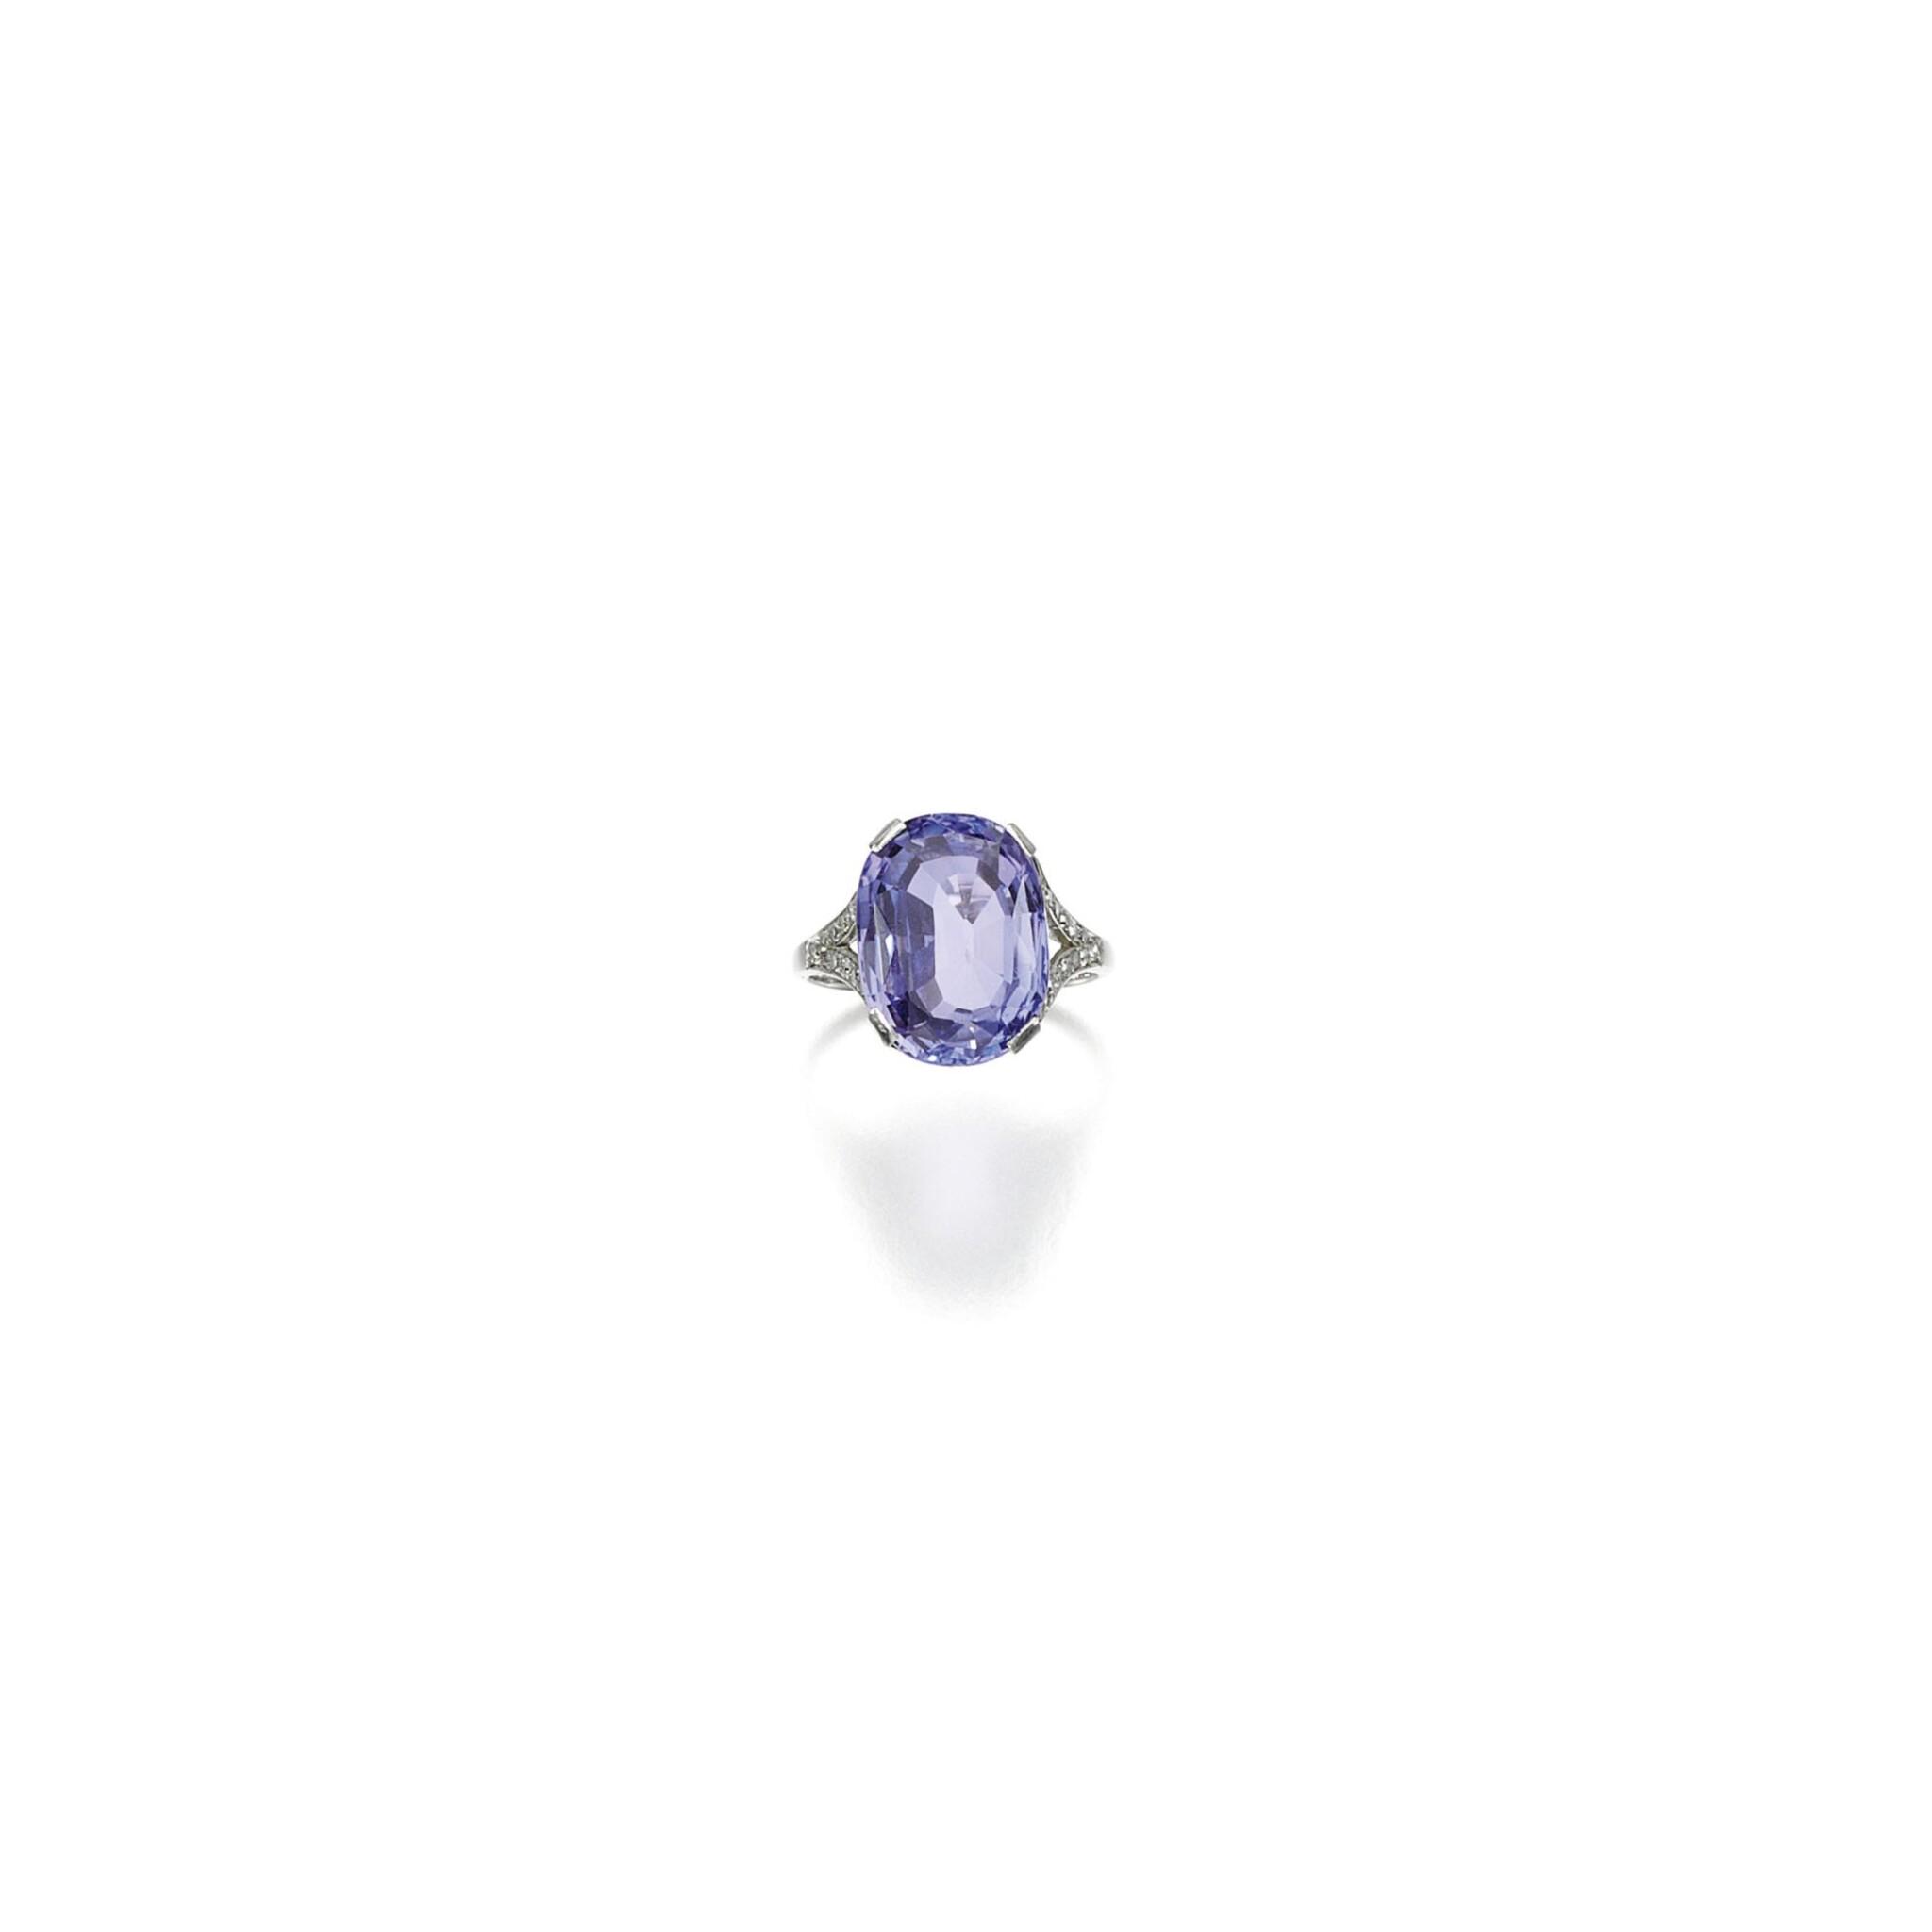 VIOLET SAPPHIRE AND DIAMOND RING, CIRCA 1910